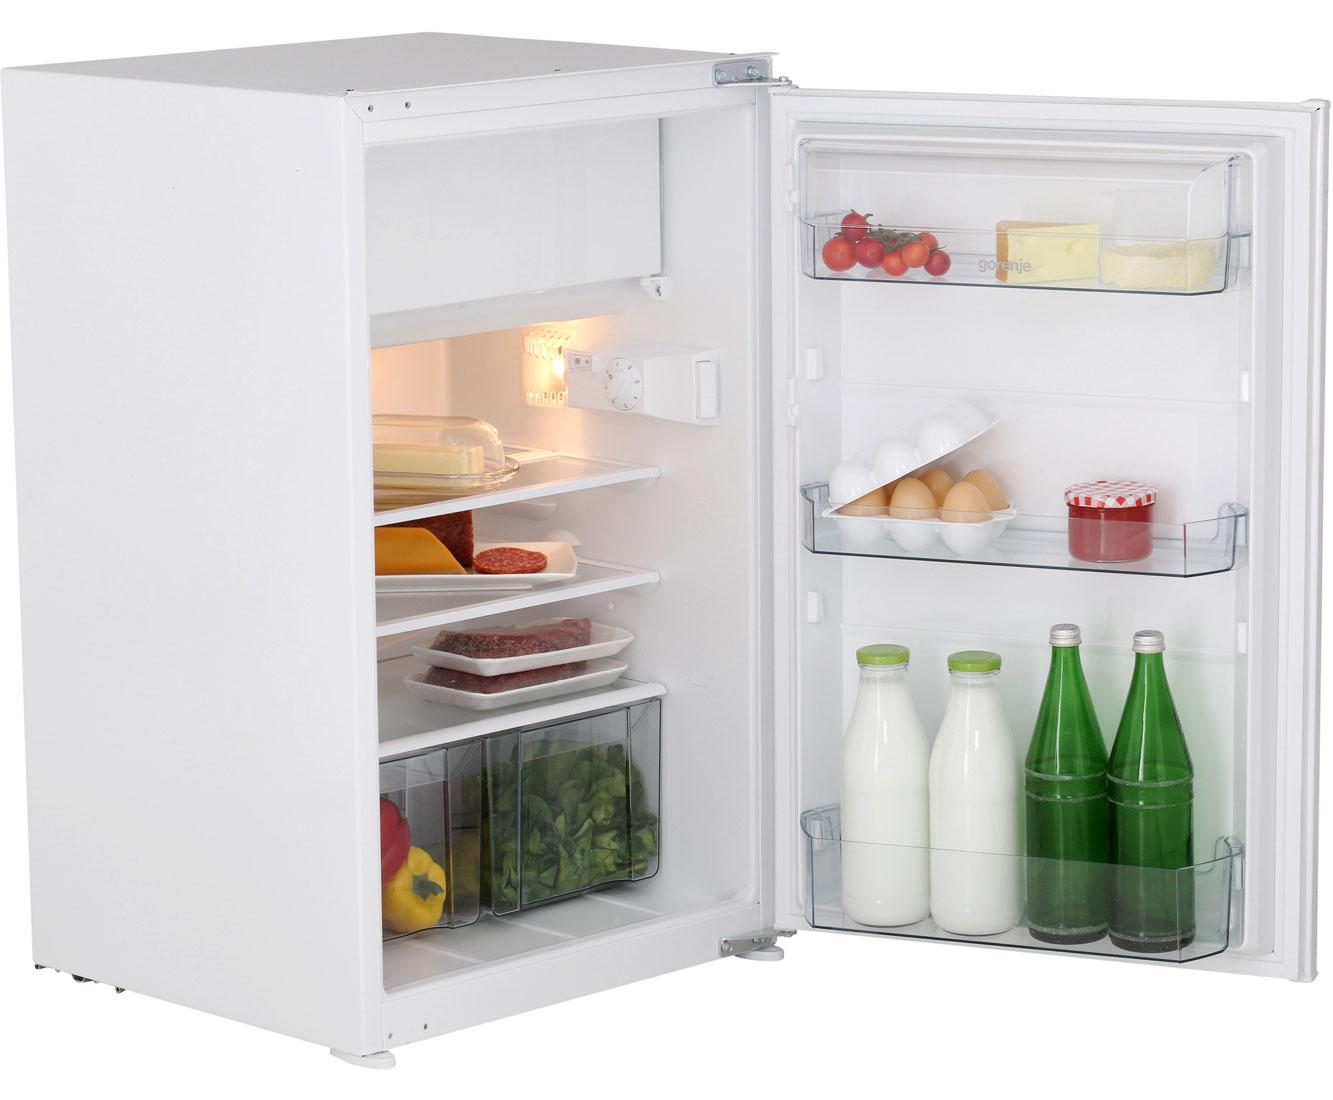 Kühlschrank No Frost A : Einbau kühlschrank no frost liebherr einbaukühlschrank uk